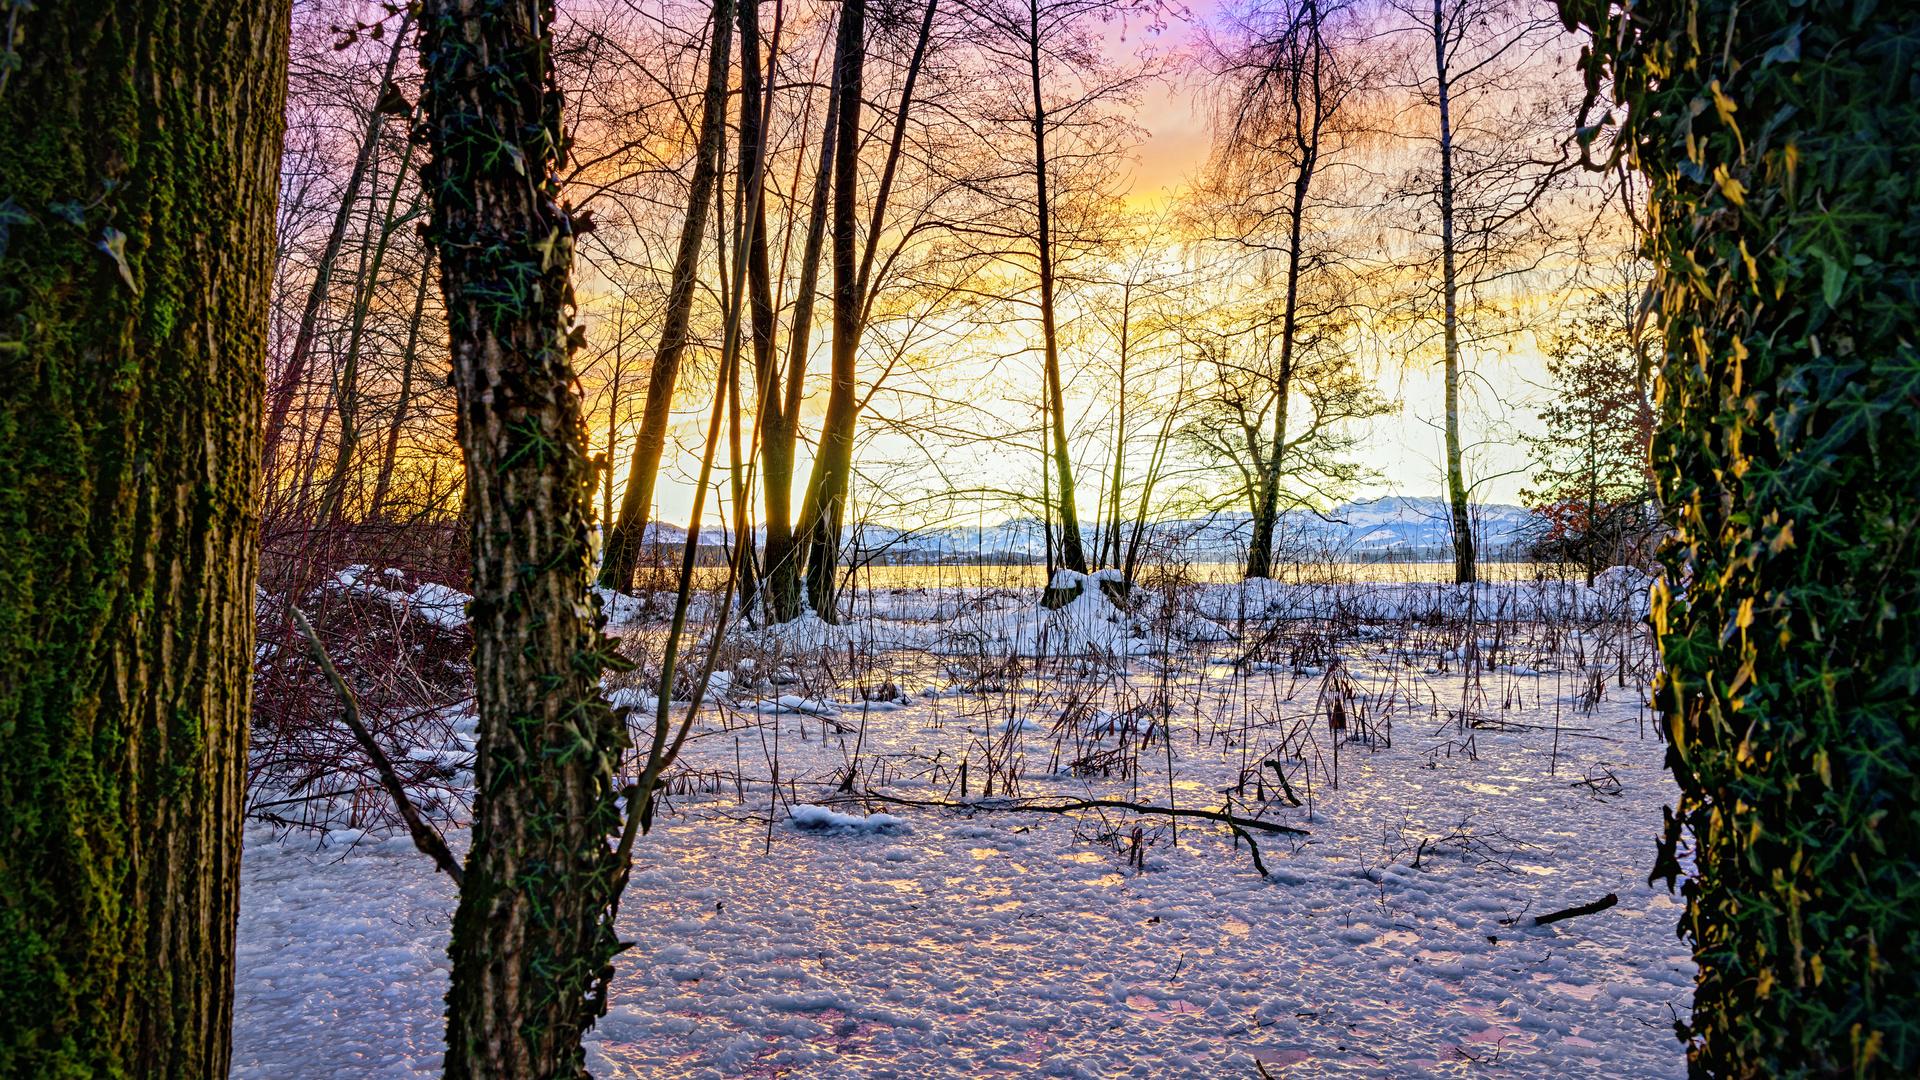 закат, зима, снег, лед, деревья, природа